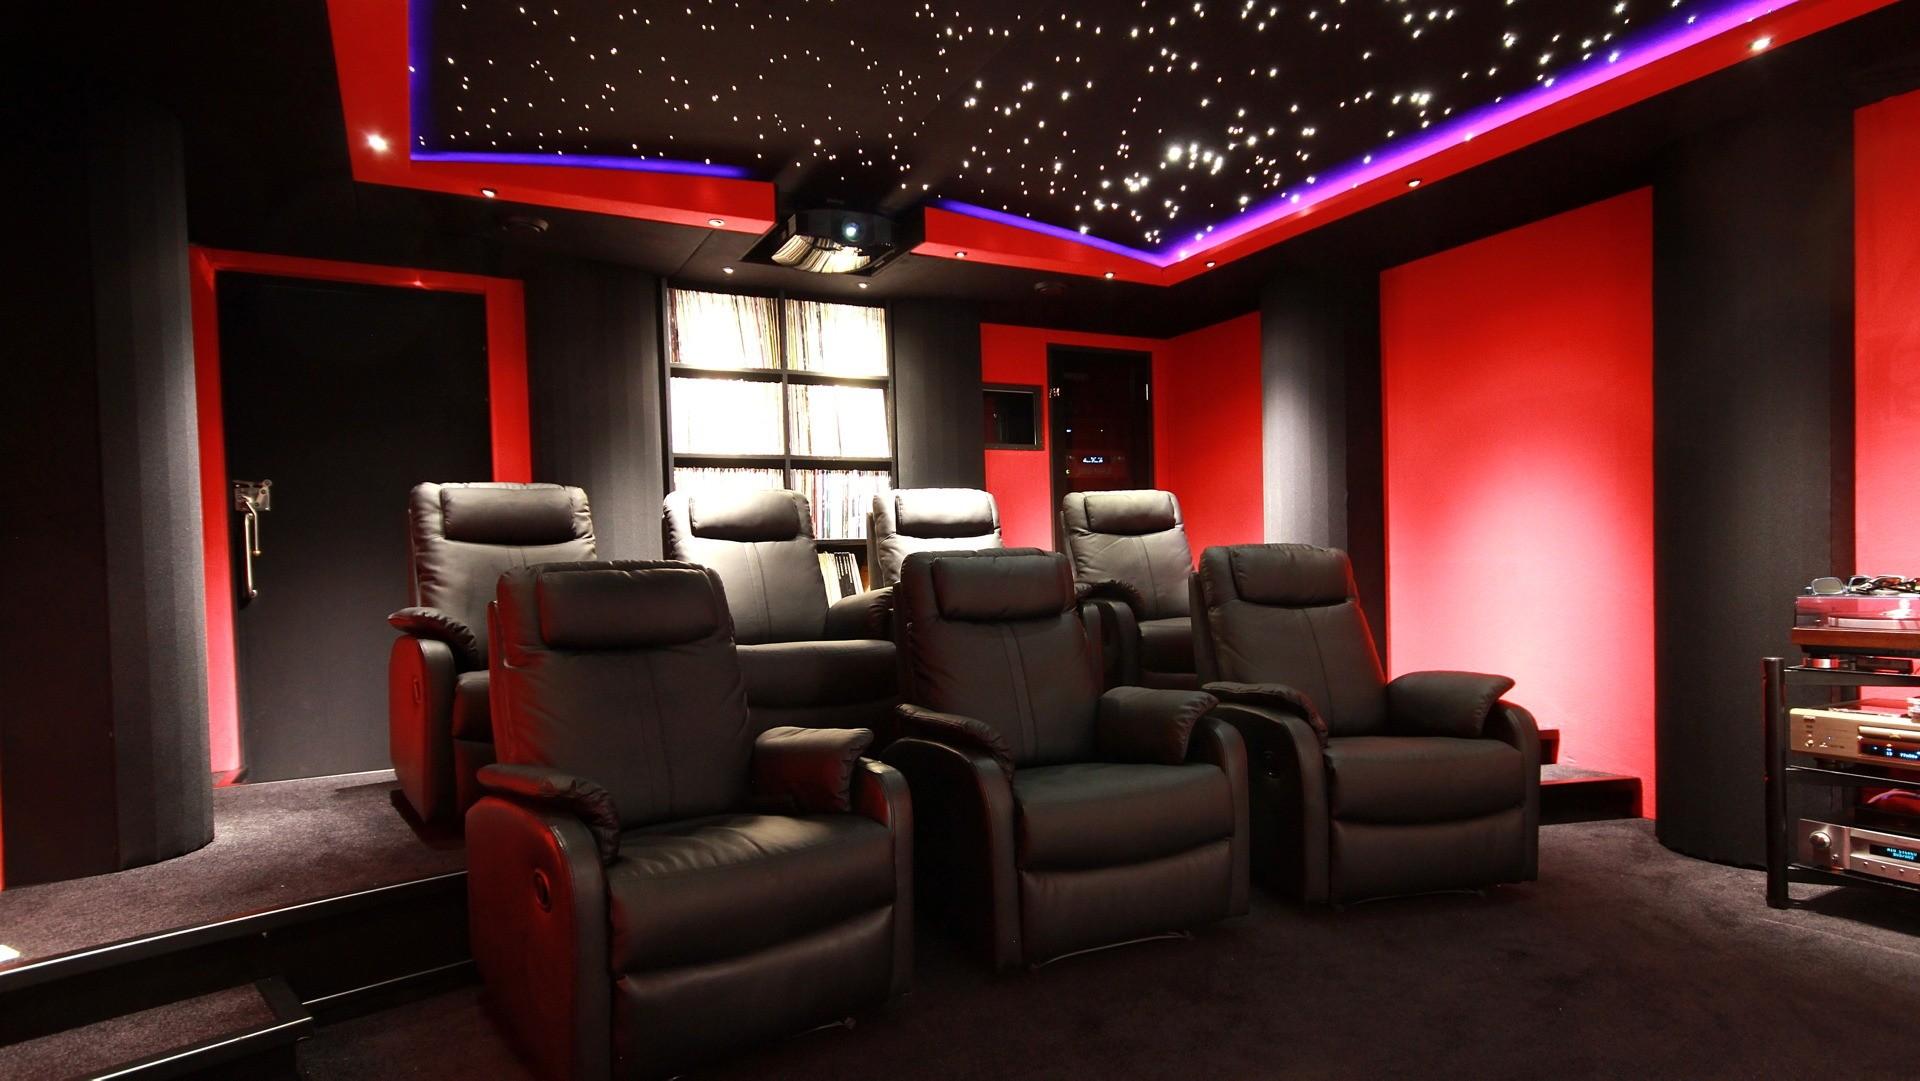 Pasos para montar un cine en casa